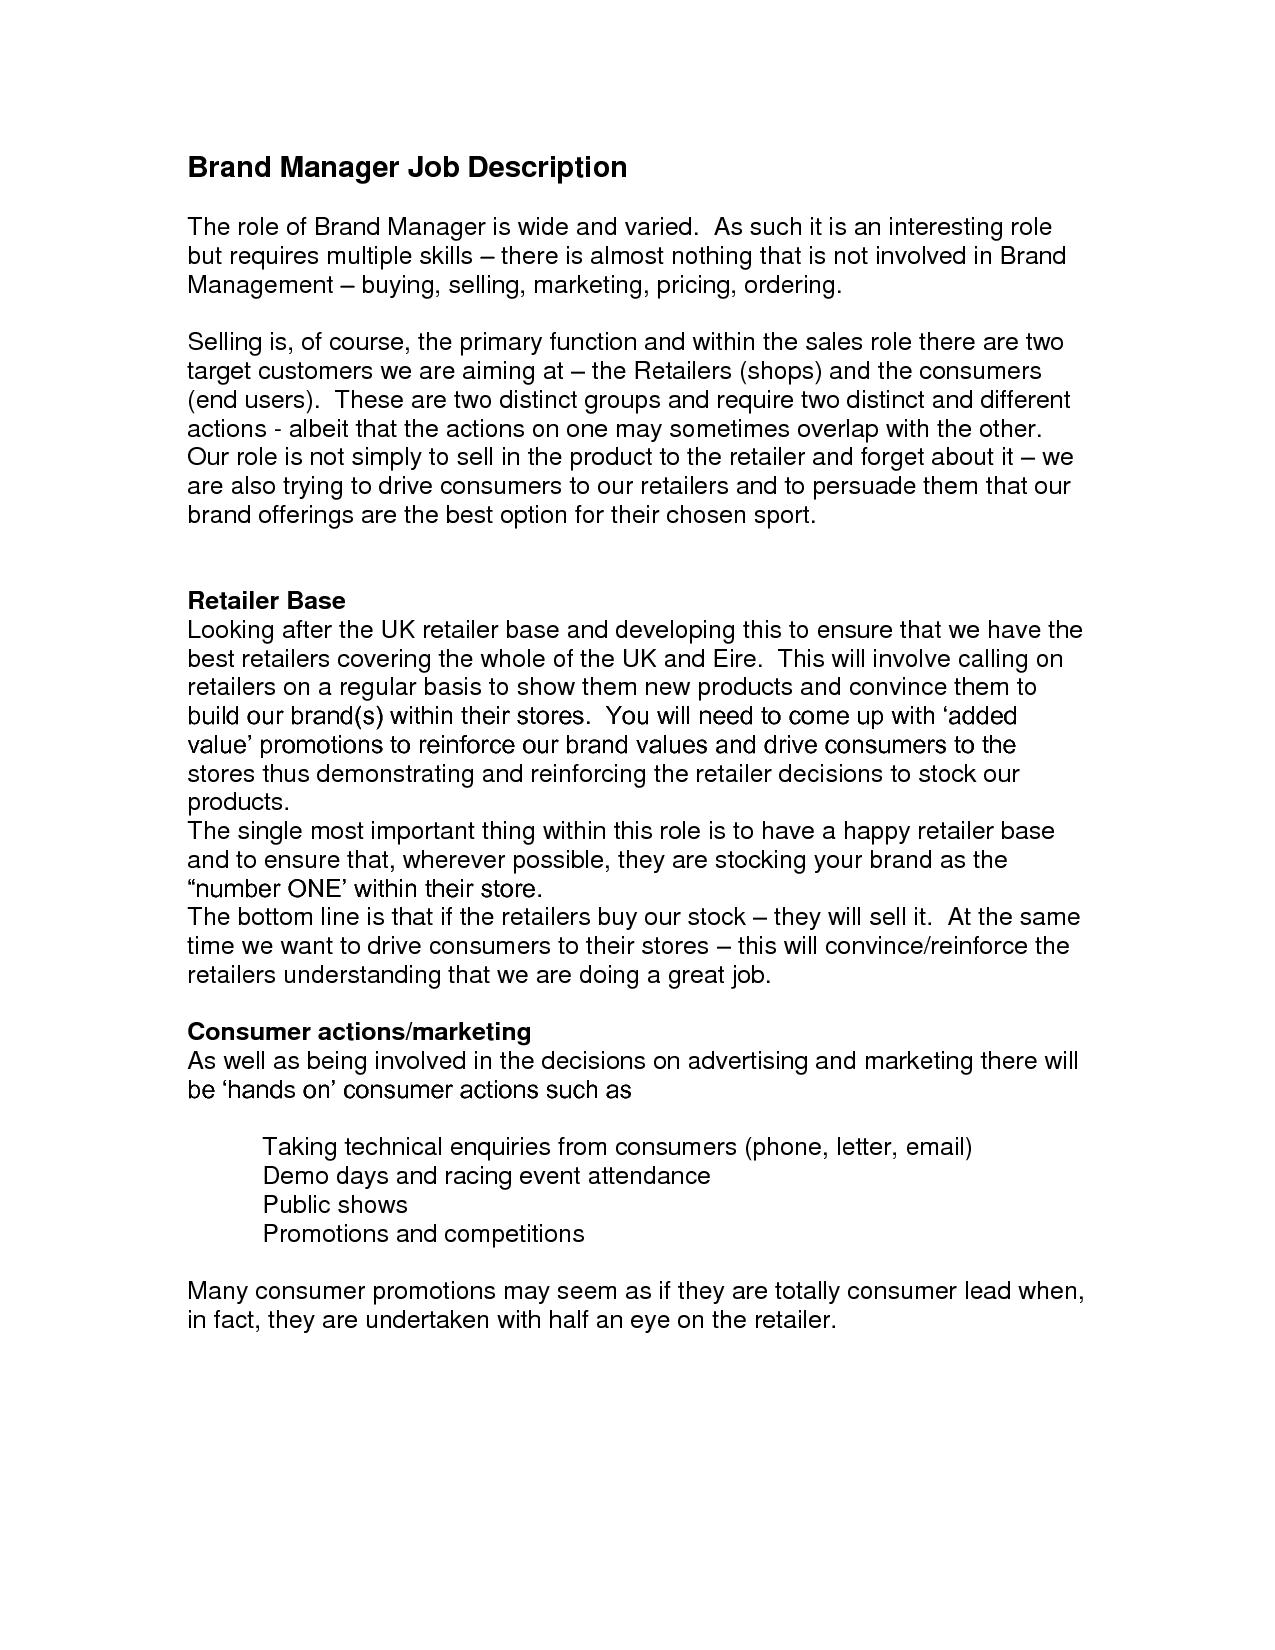 Job Description Quotes QuotesGram – Brand Manager Job Description